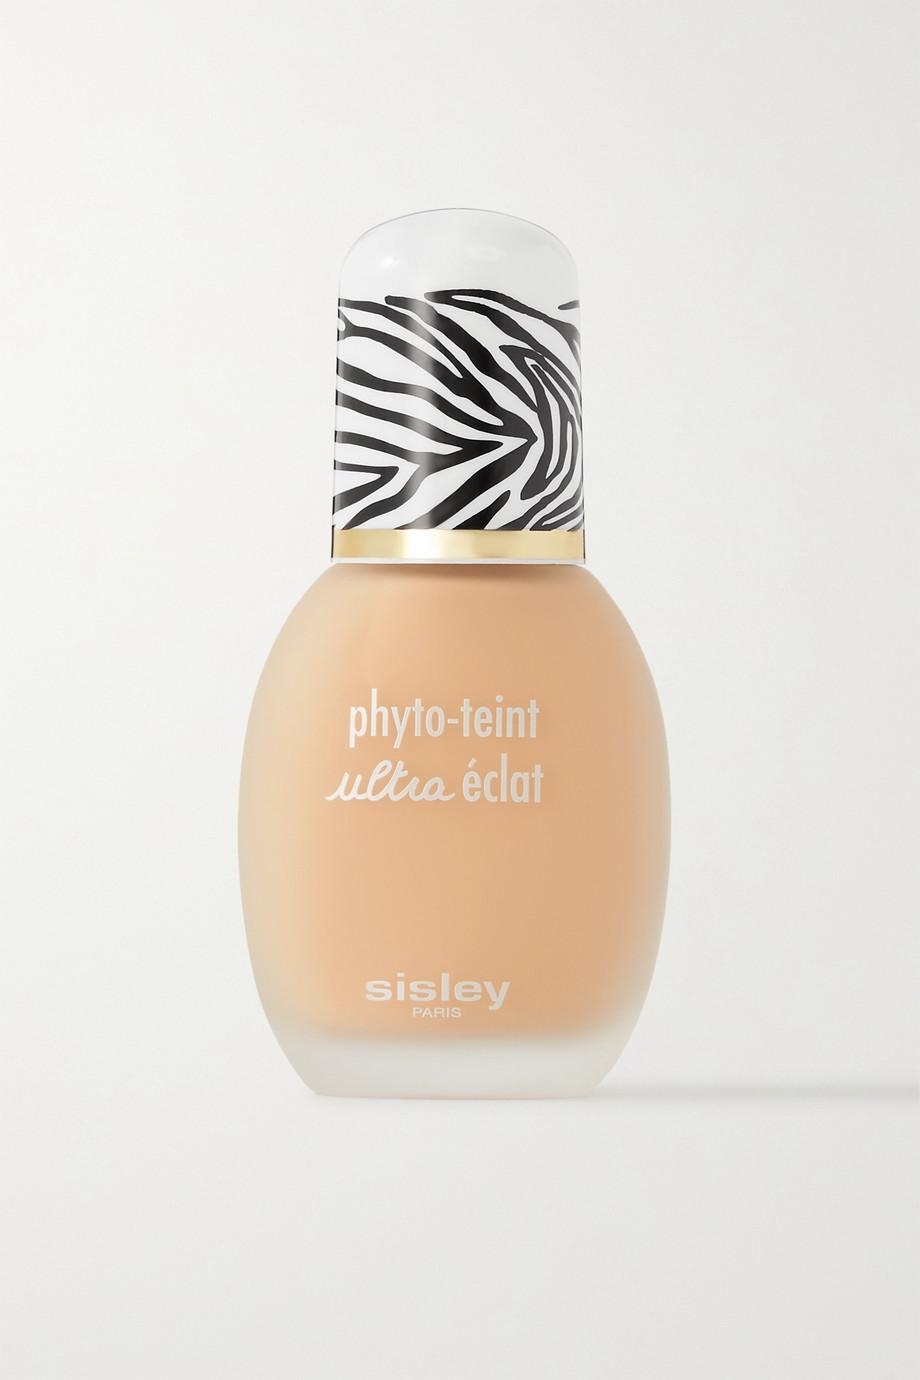 Sisley Phyto-Teint Ultra Éclat Radiance Boosting Foundation - 1+ Ecru, 30ml